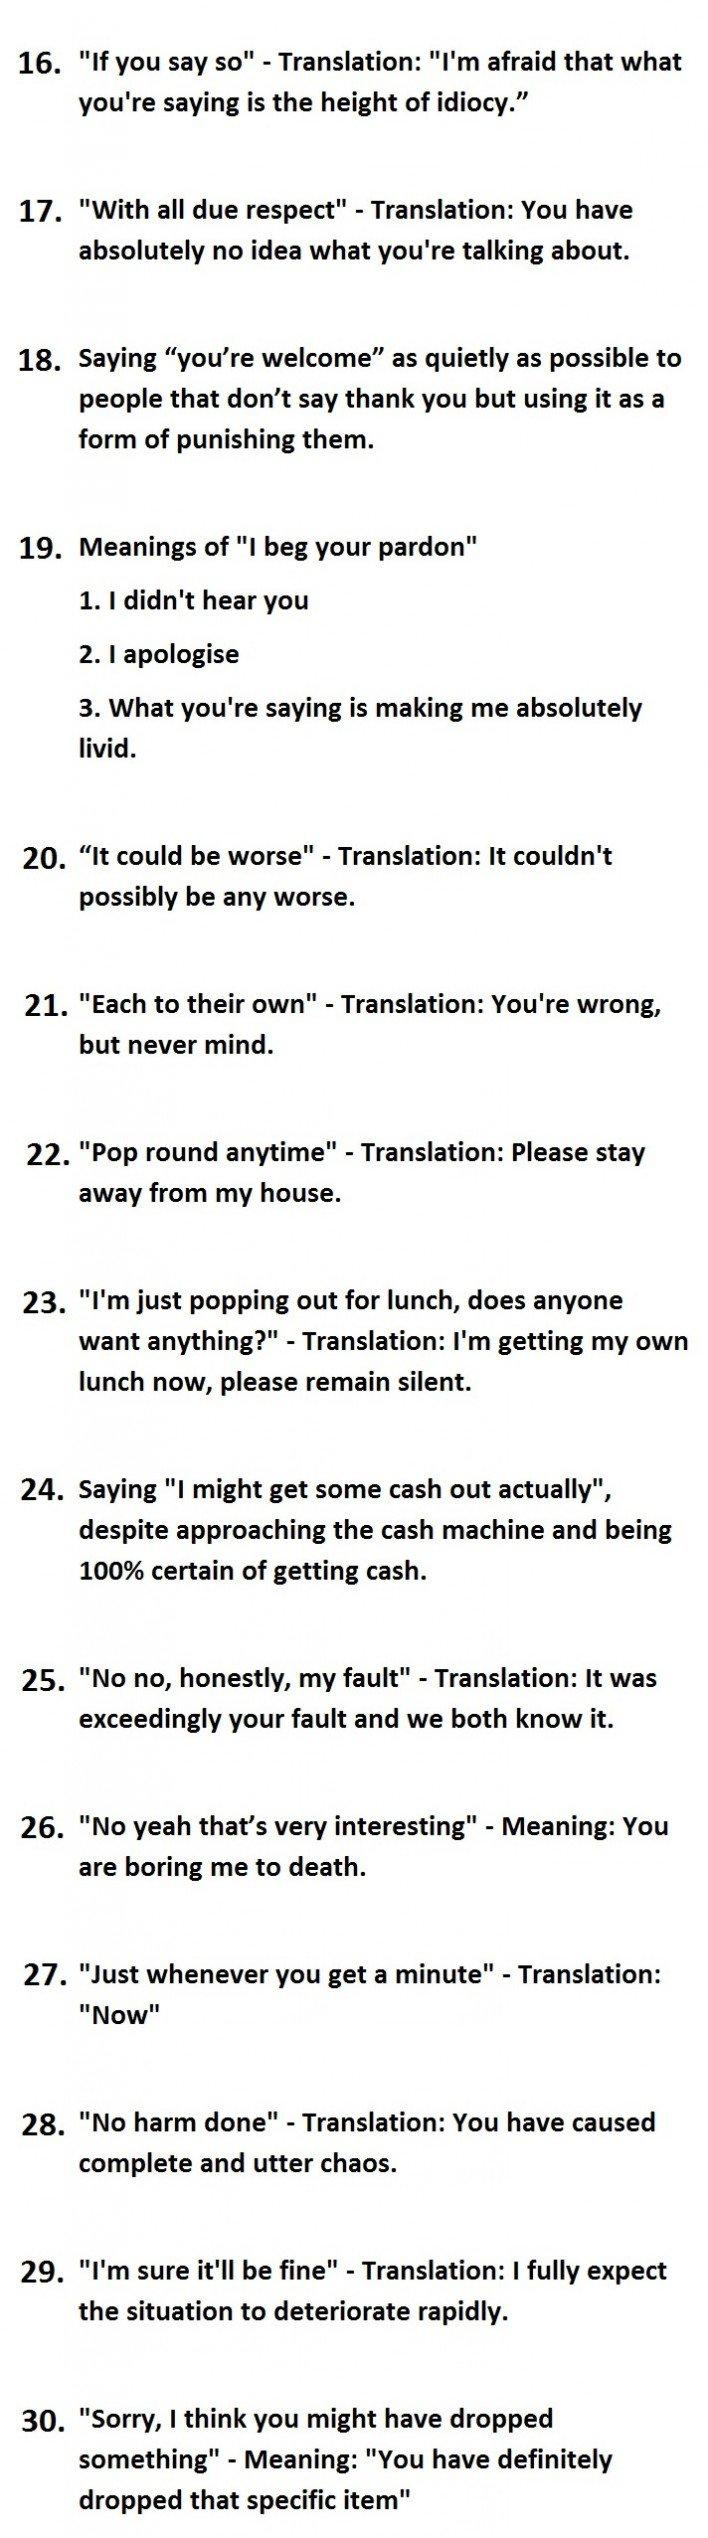 The Great British hidden language  Englis11